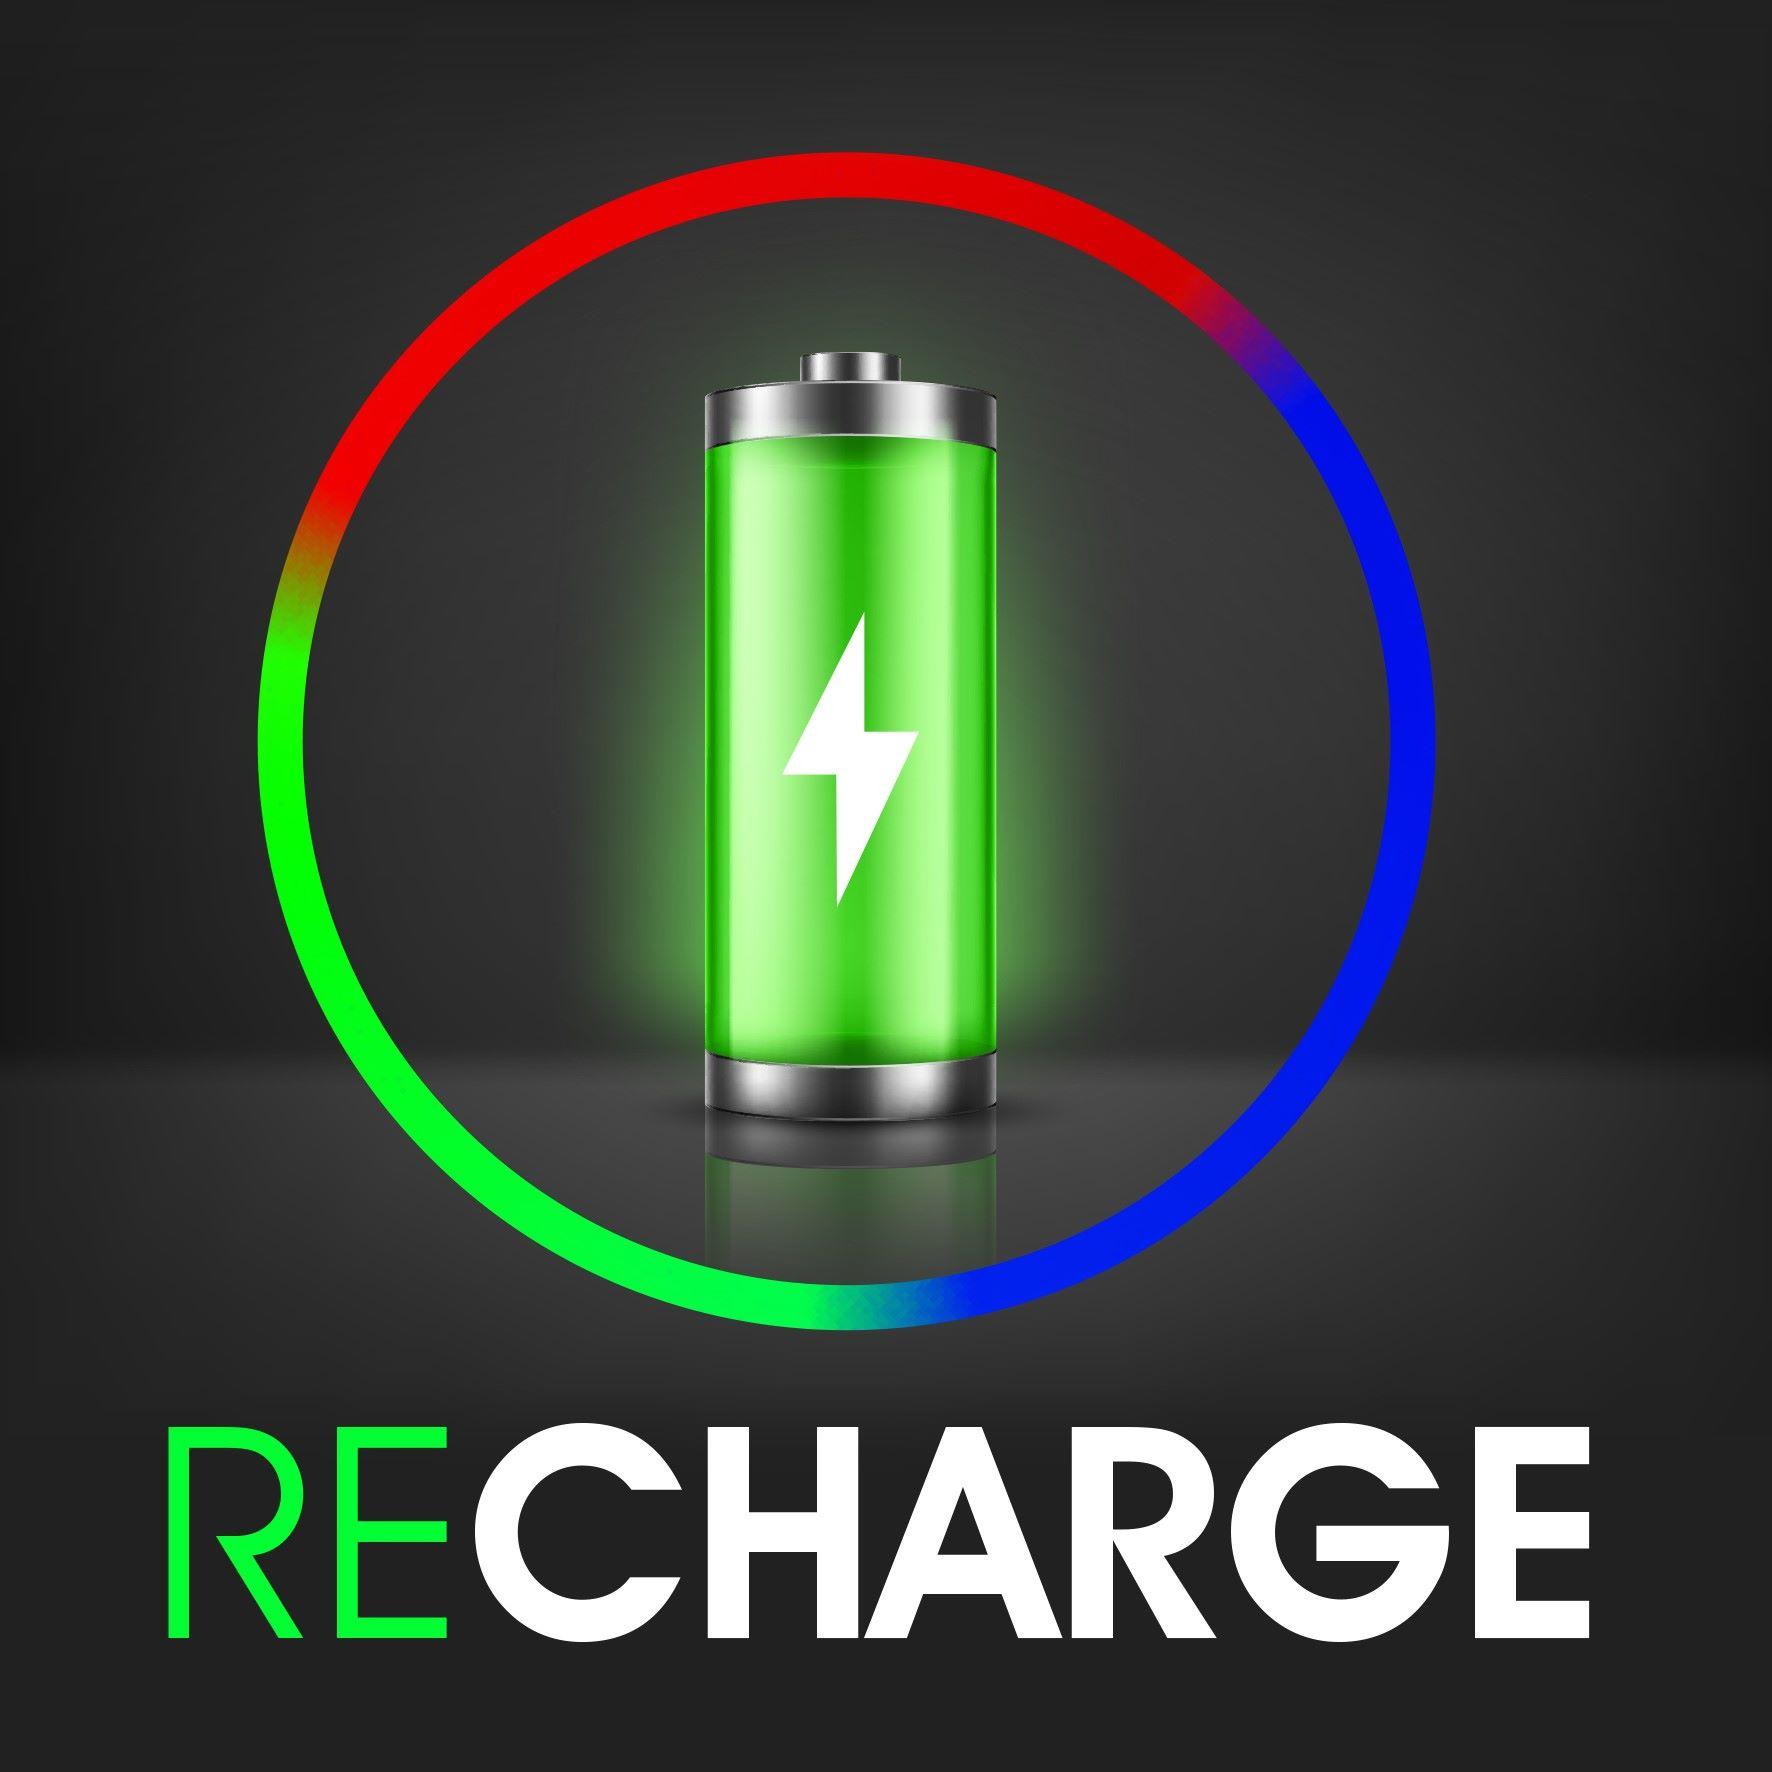 Recharge_squ_1700